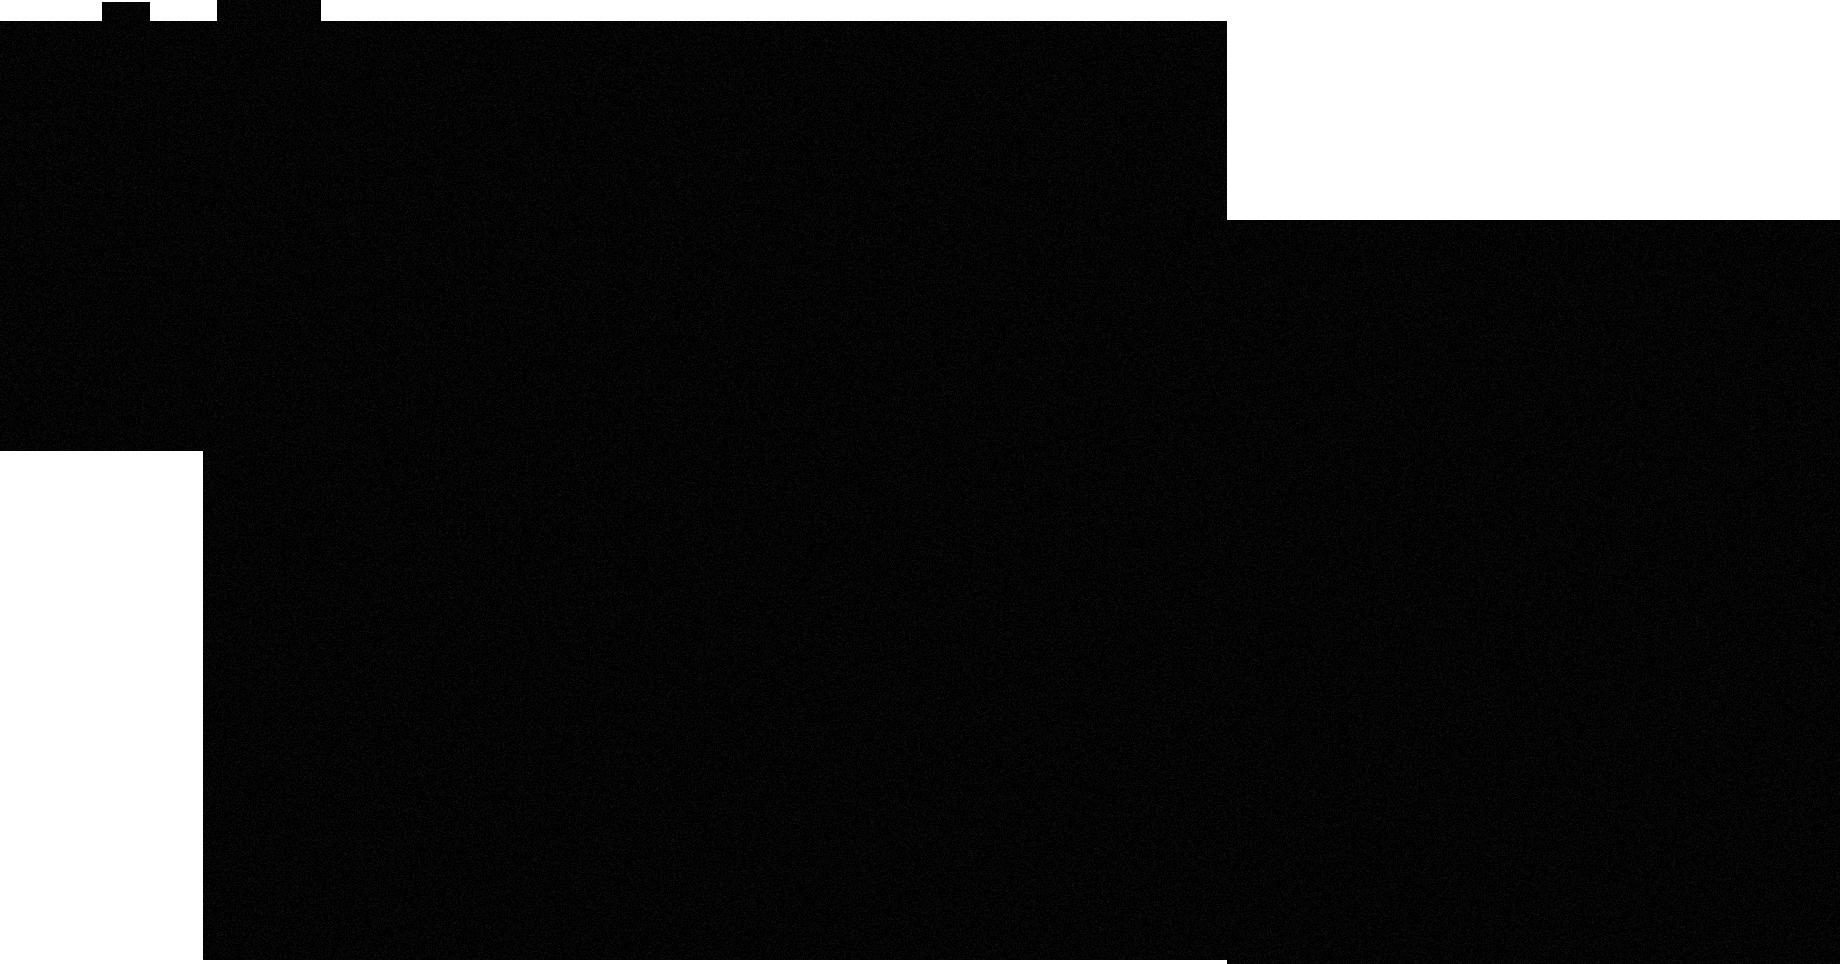 MoovOn Handheld Device Shadow